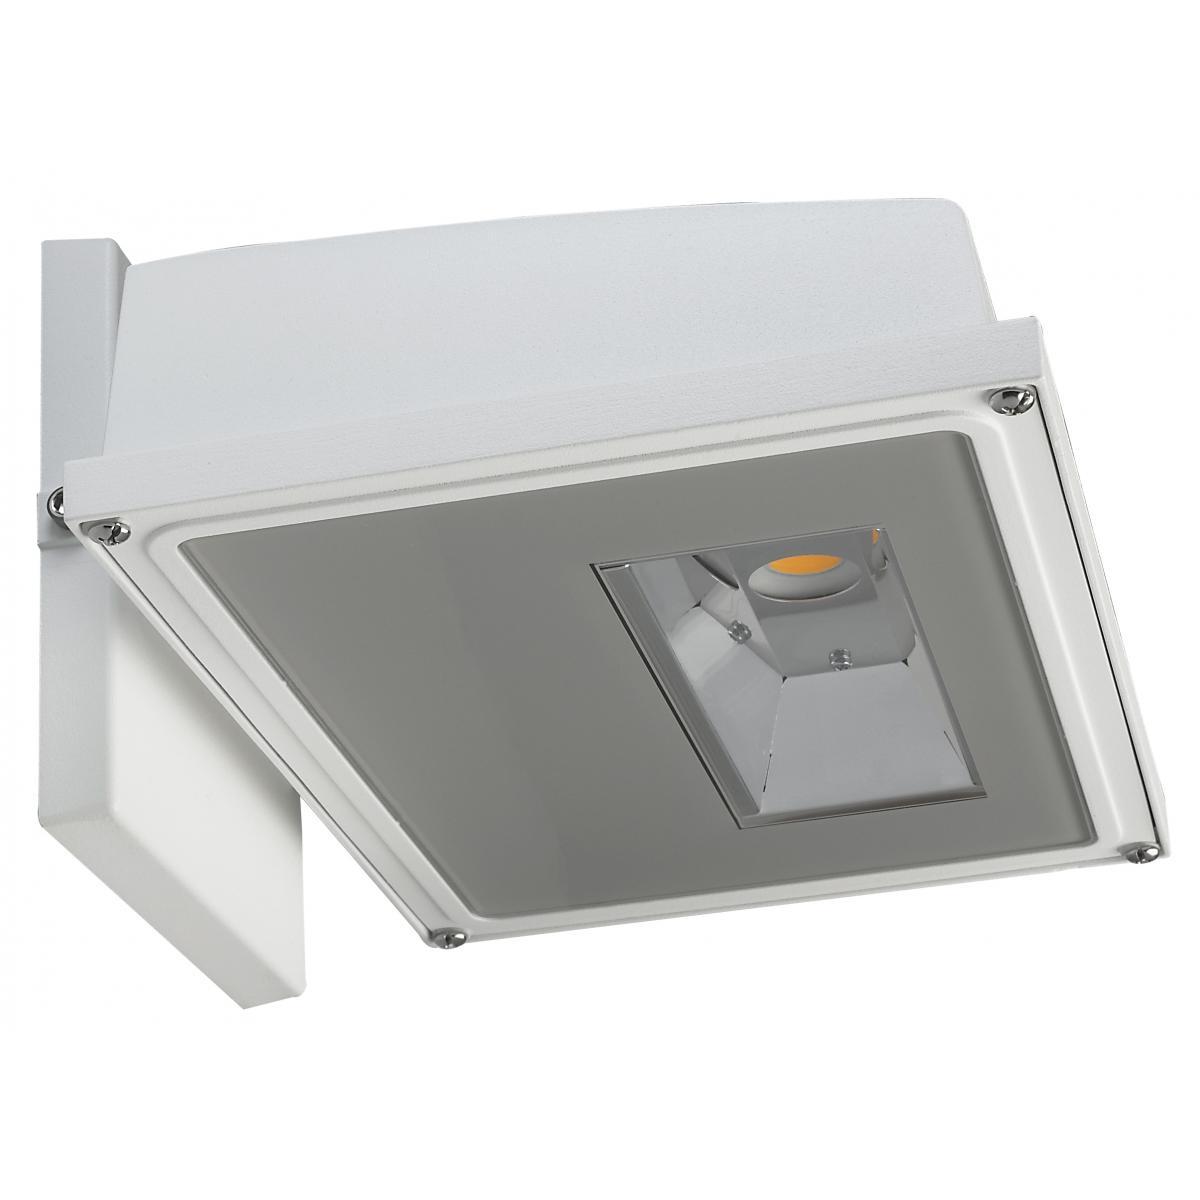 65-154 11W LED WALL PACK WHITE 4000K